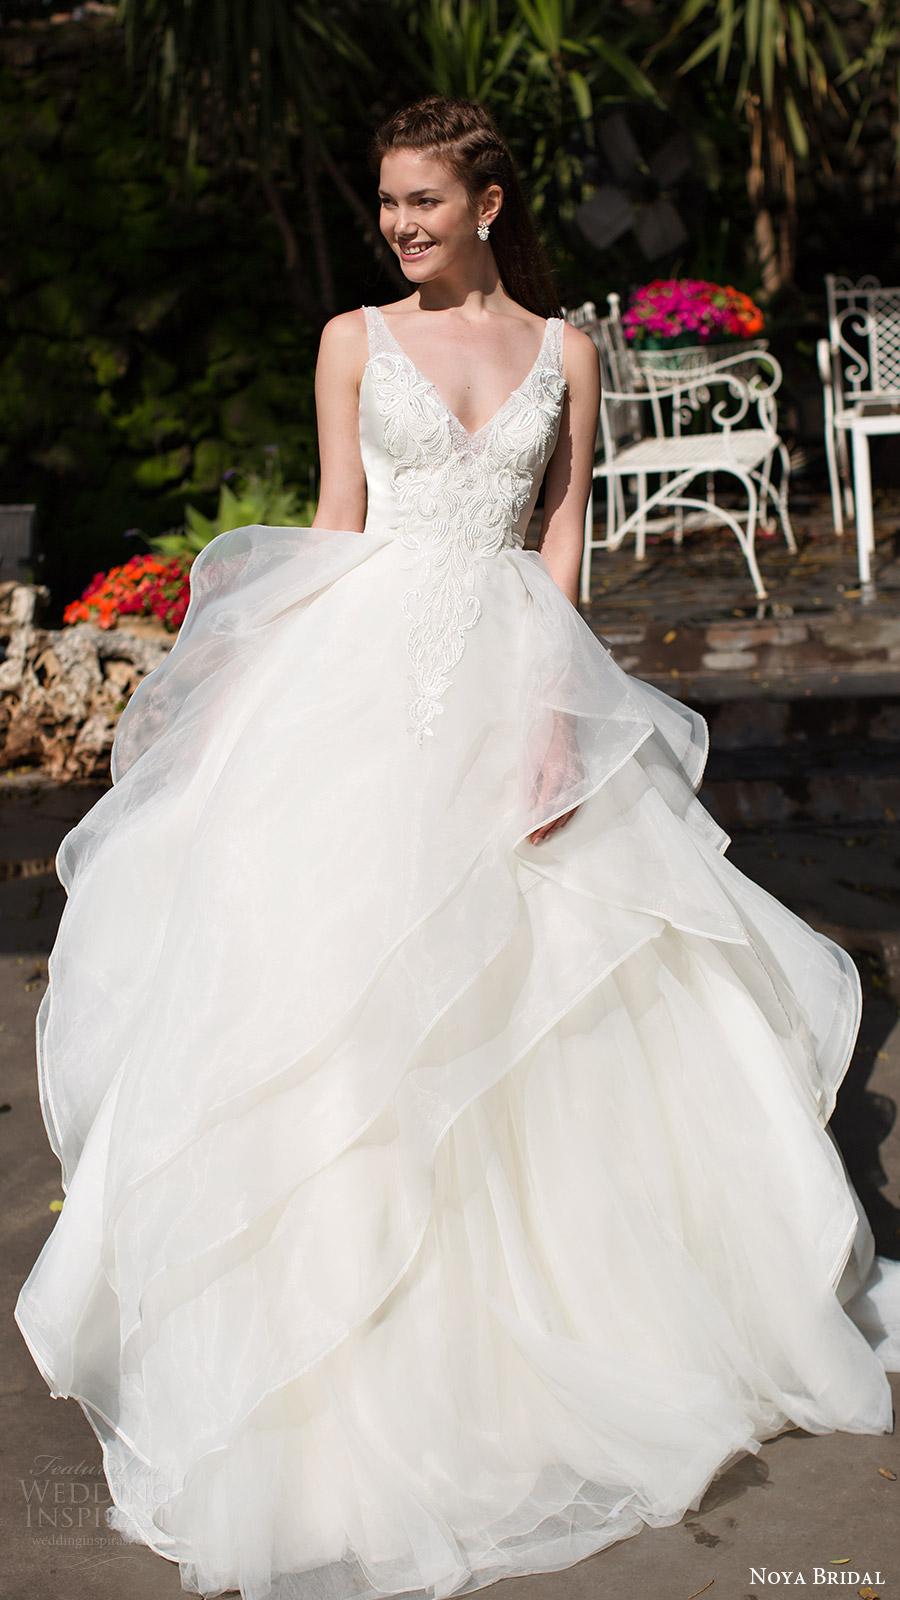 Noya Bridal Aria Collection Wedding Dresses Wedding